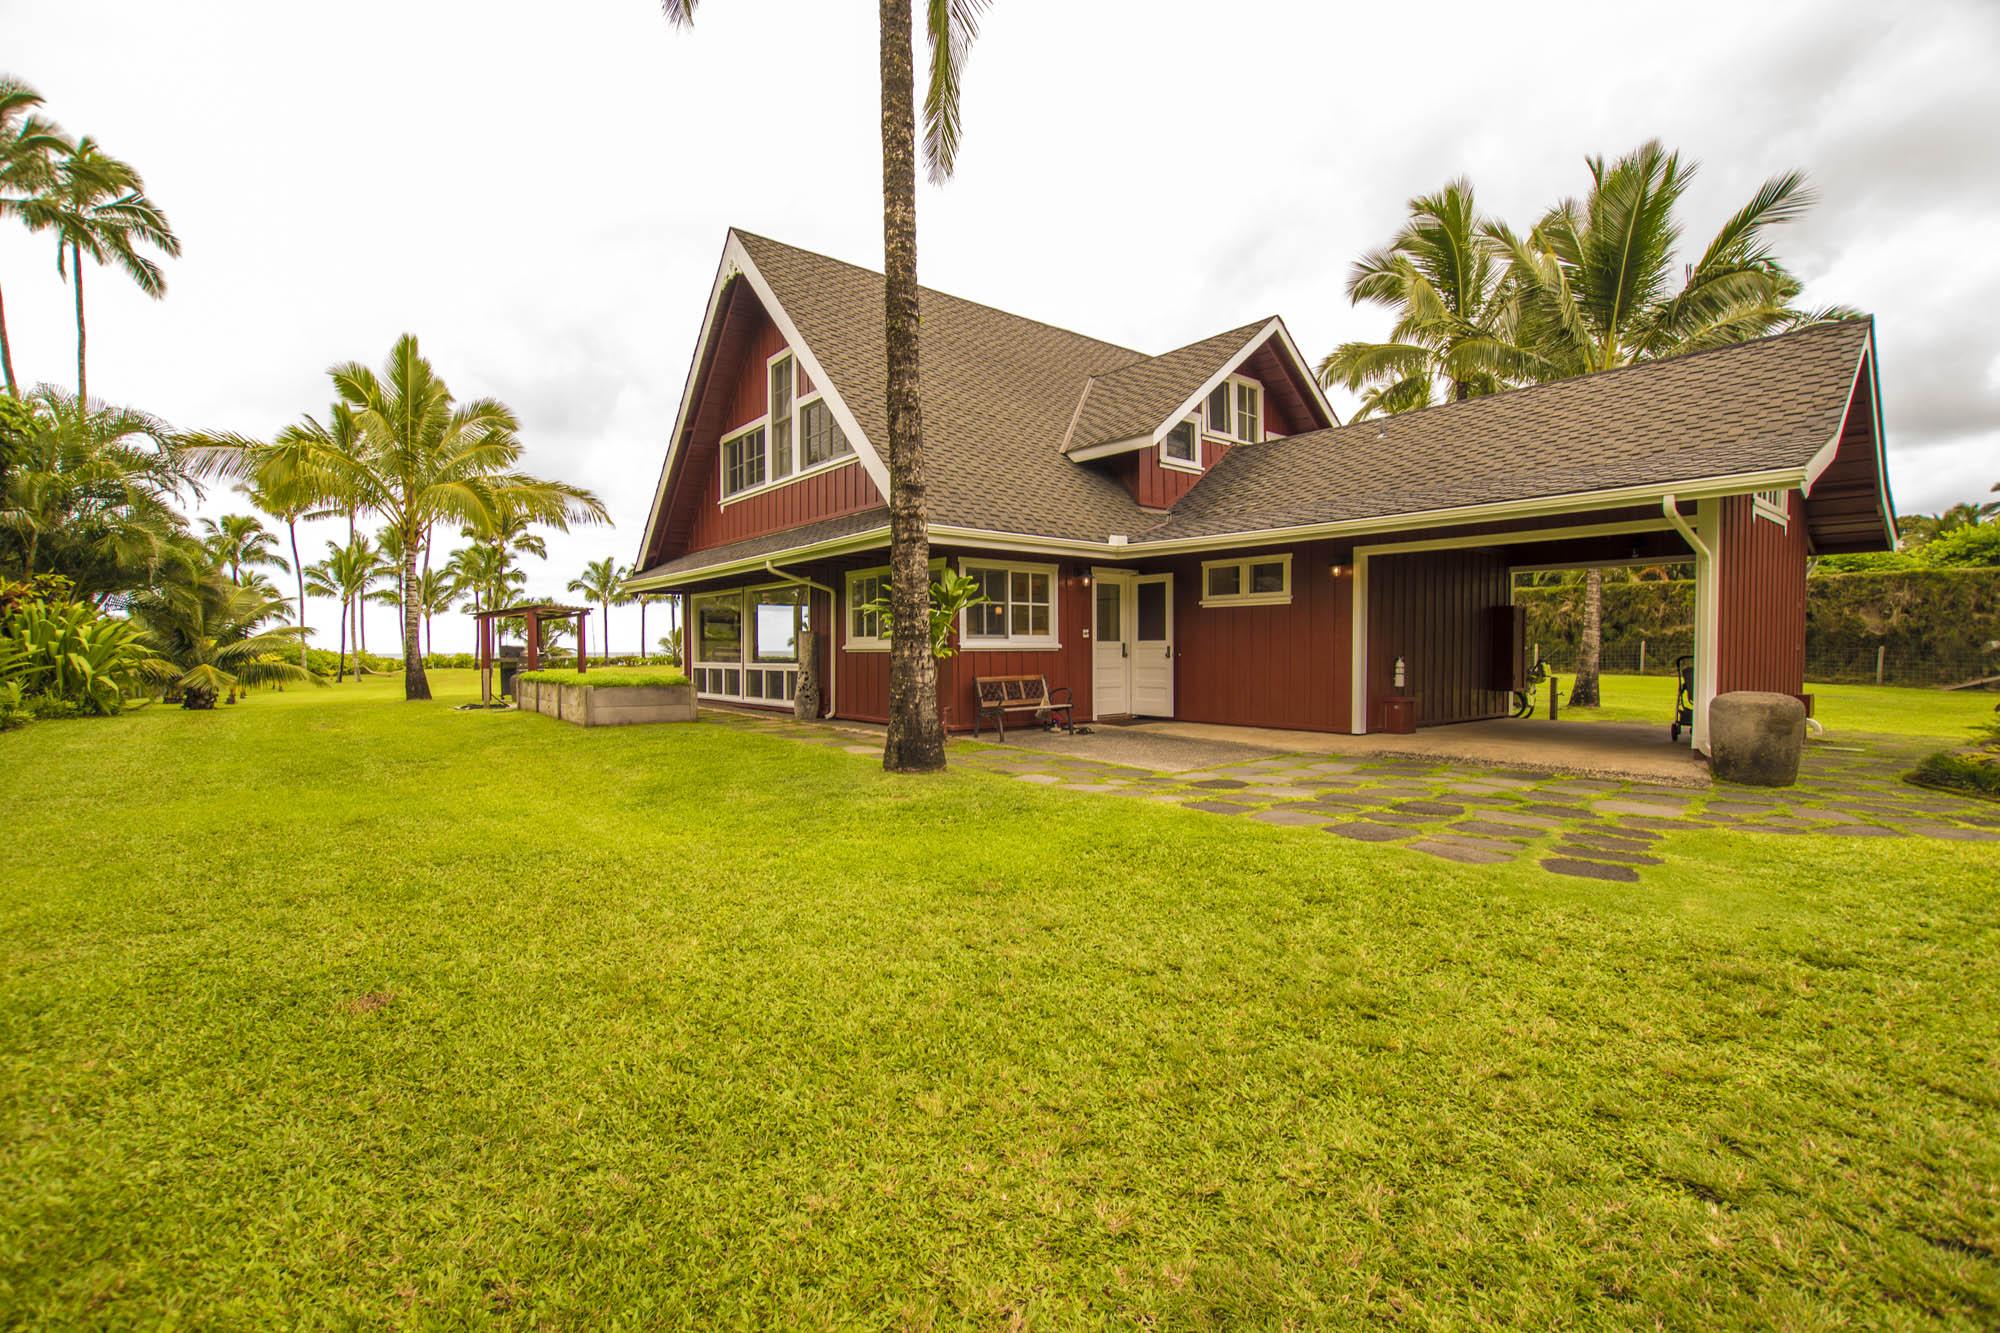 Kauai-217-Hanalei Bay7